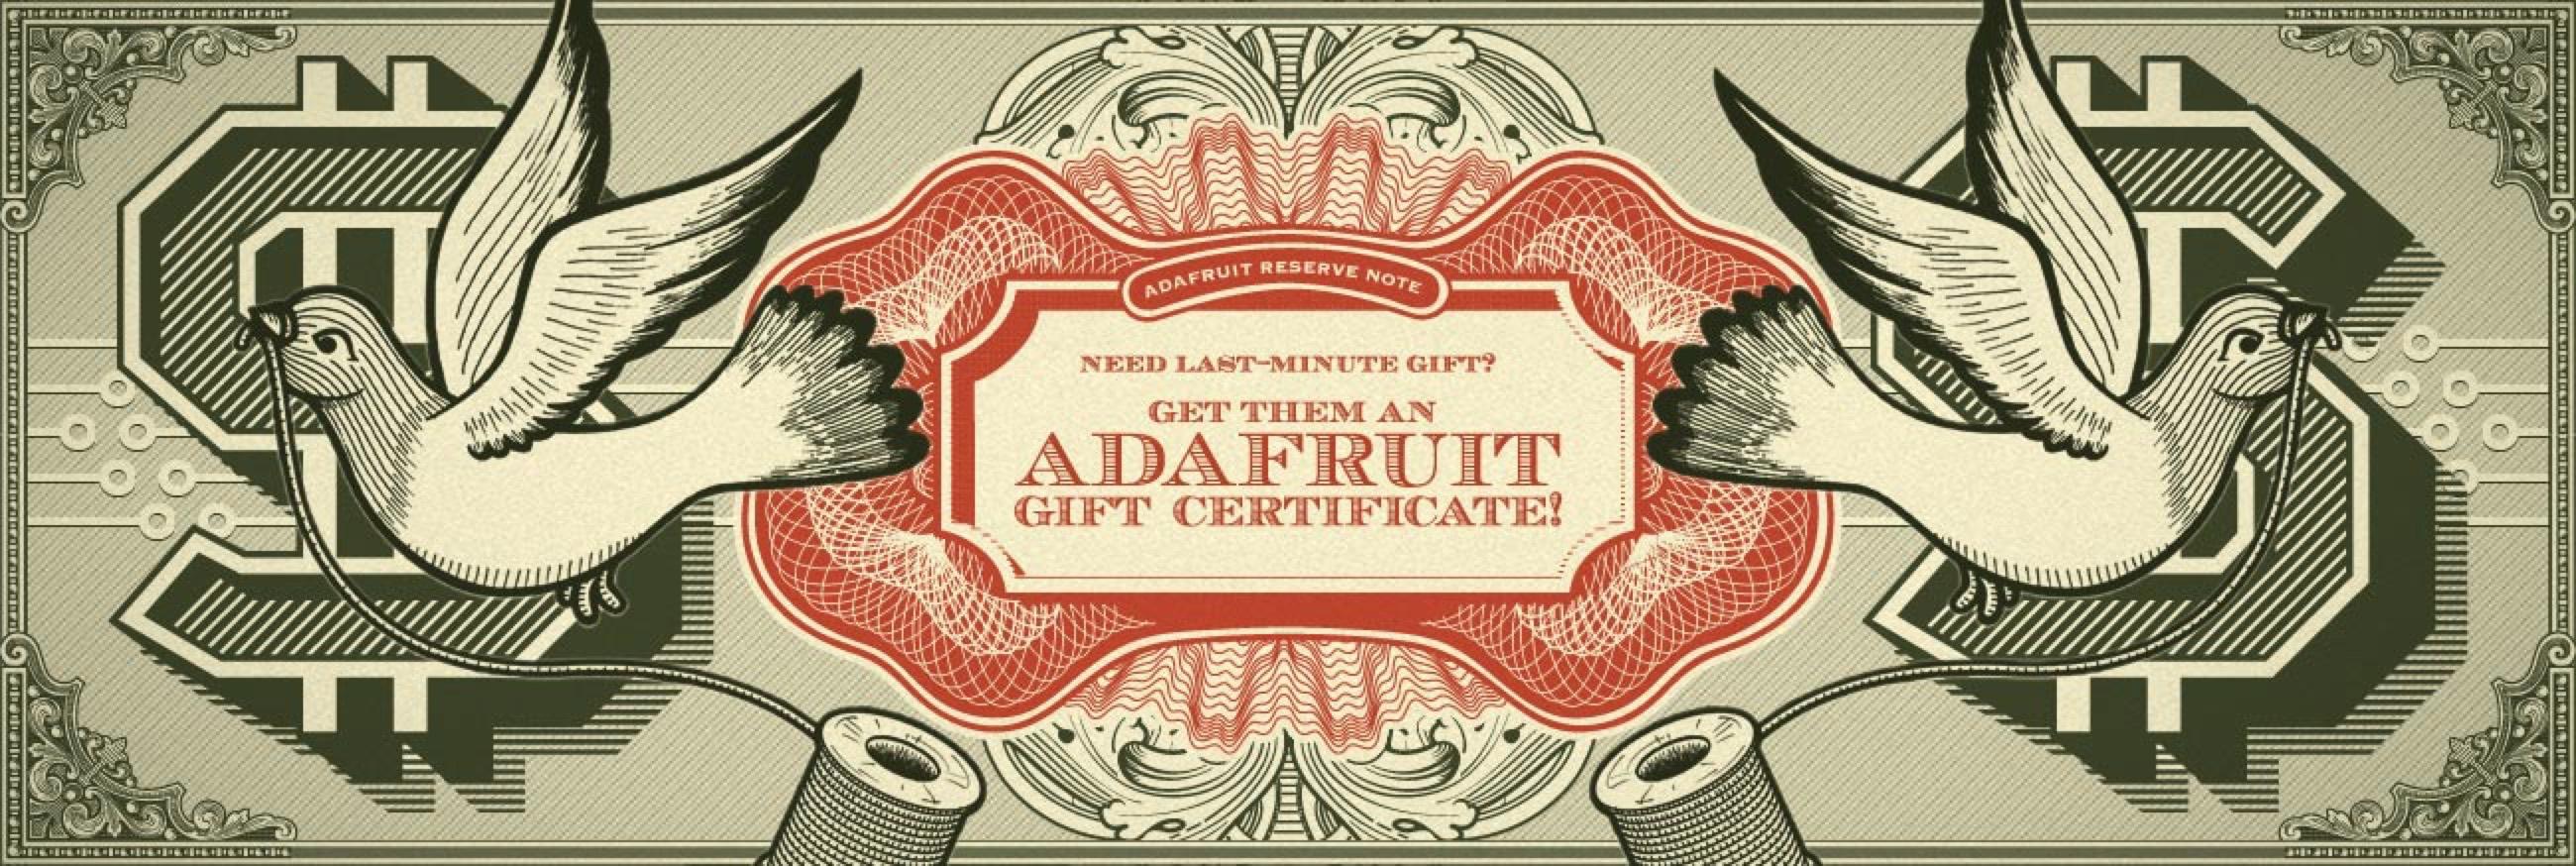 Adafruit Gift Certificate Hero